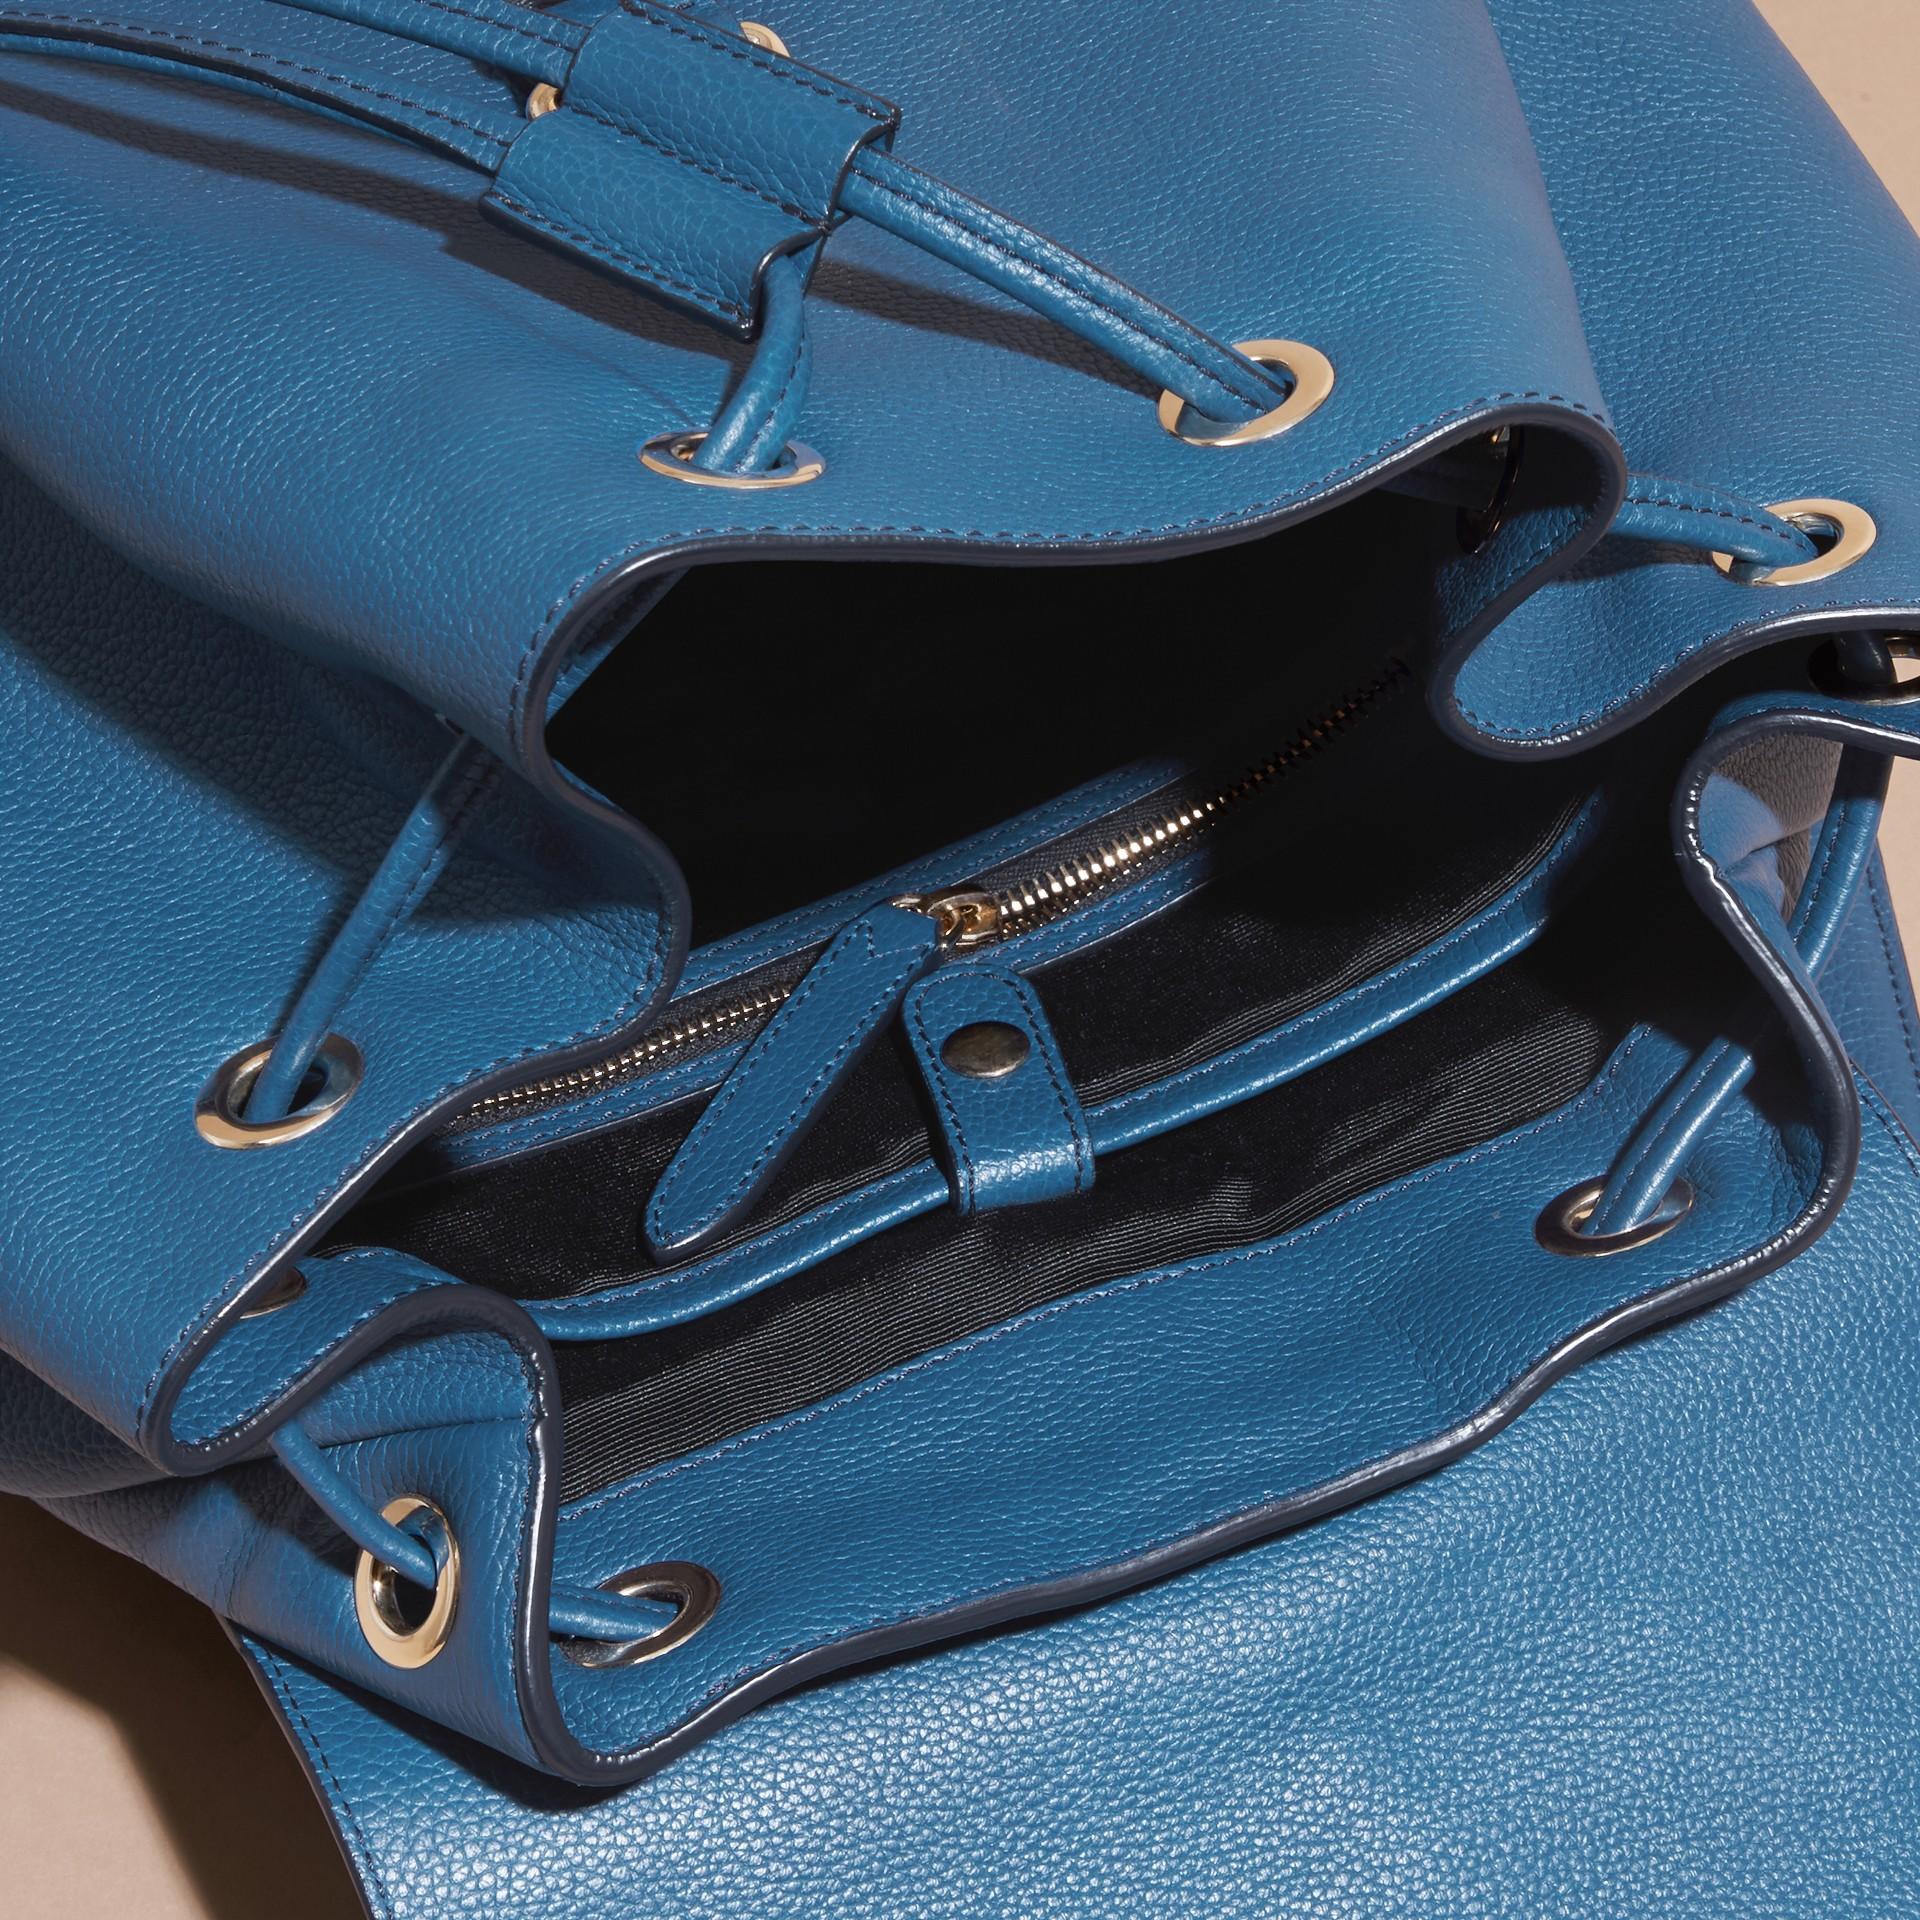 Mineralblau Rucksack aus genarbtem Leder Mineralblau - Galerie-Bild 6